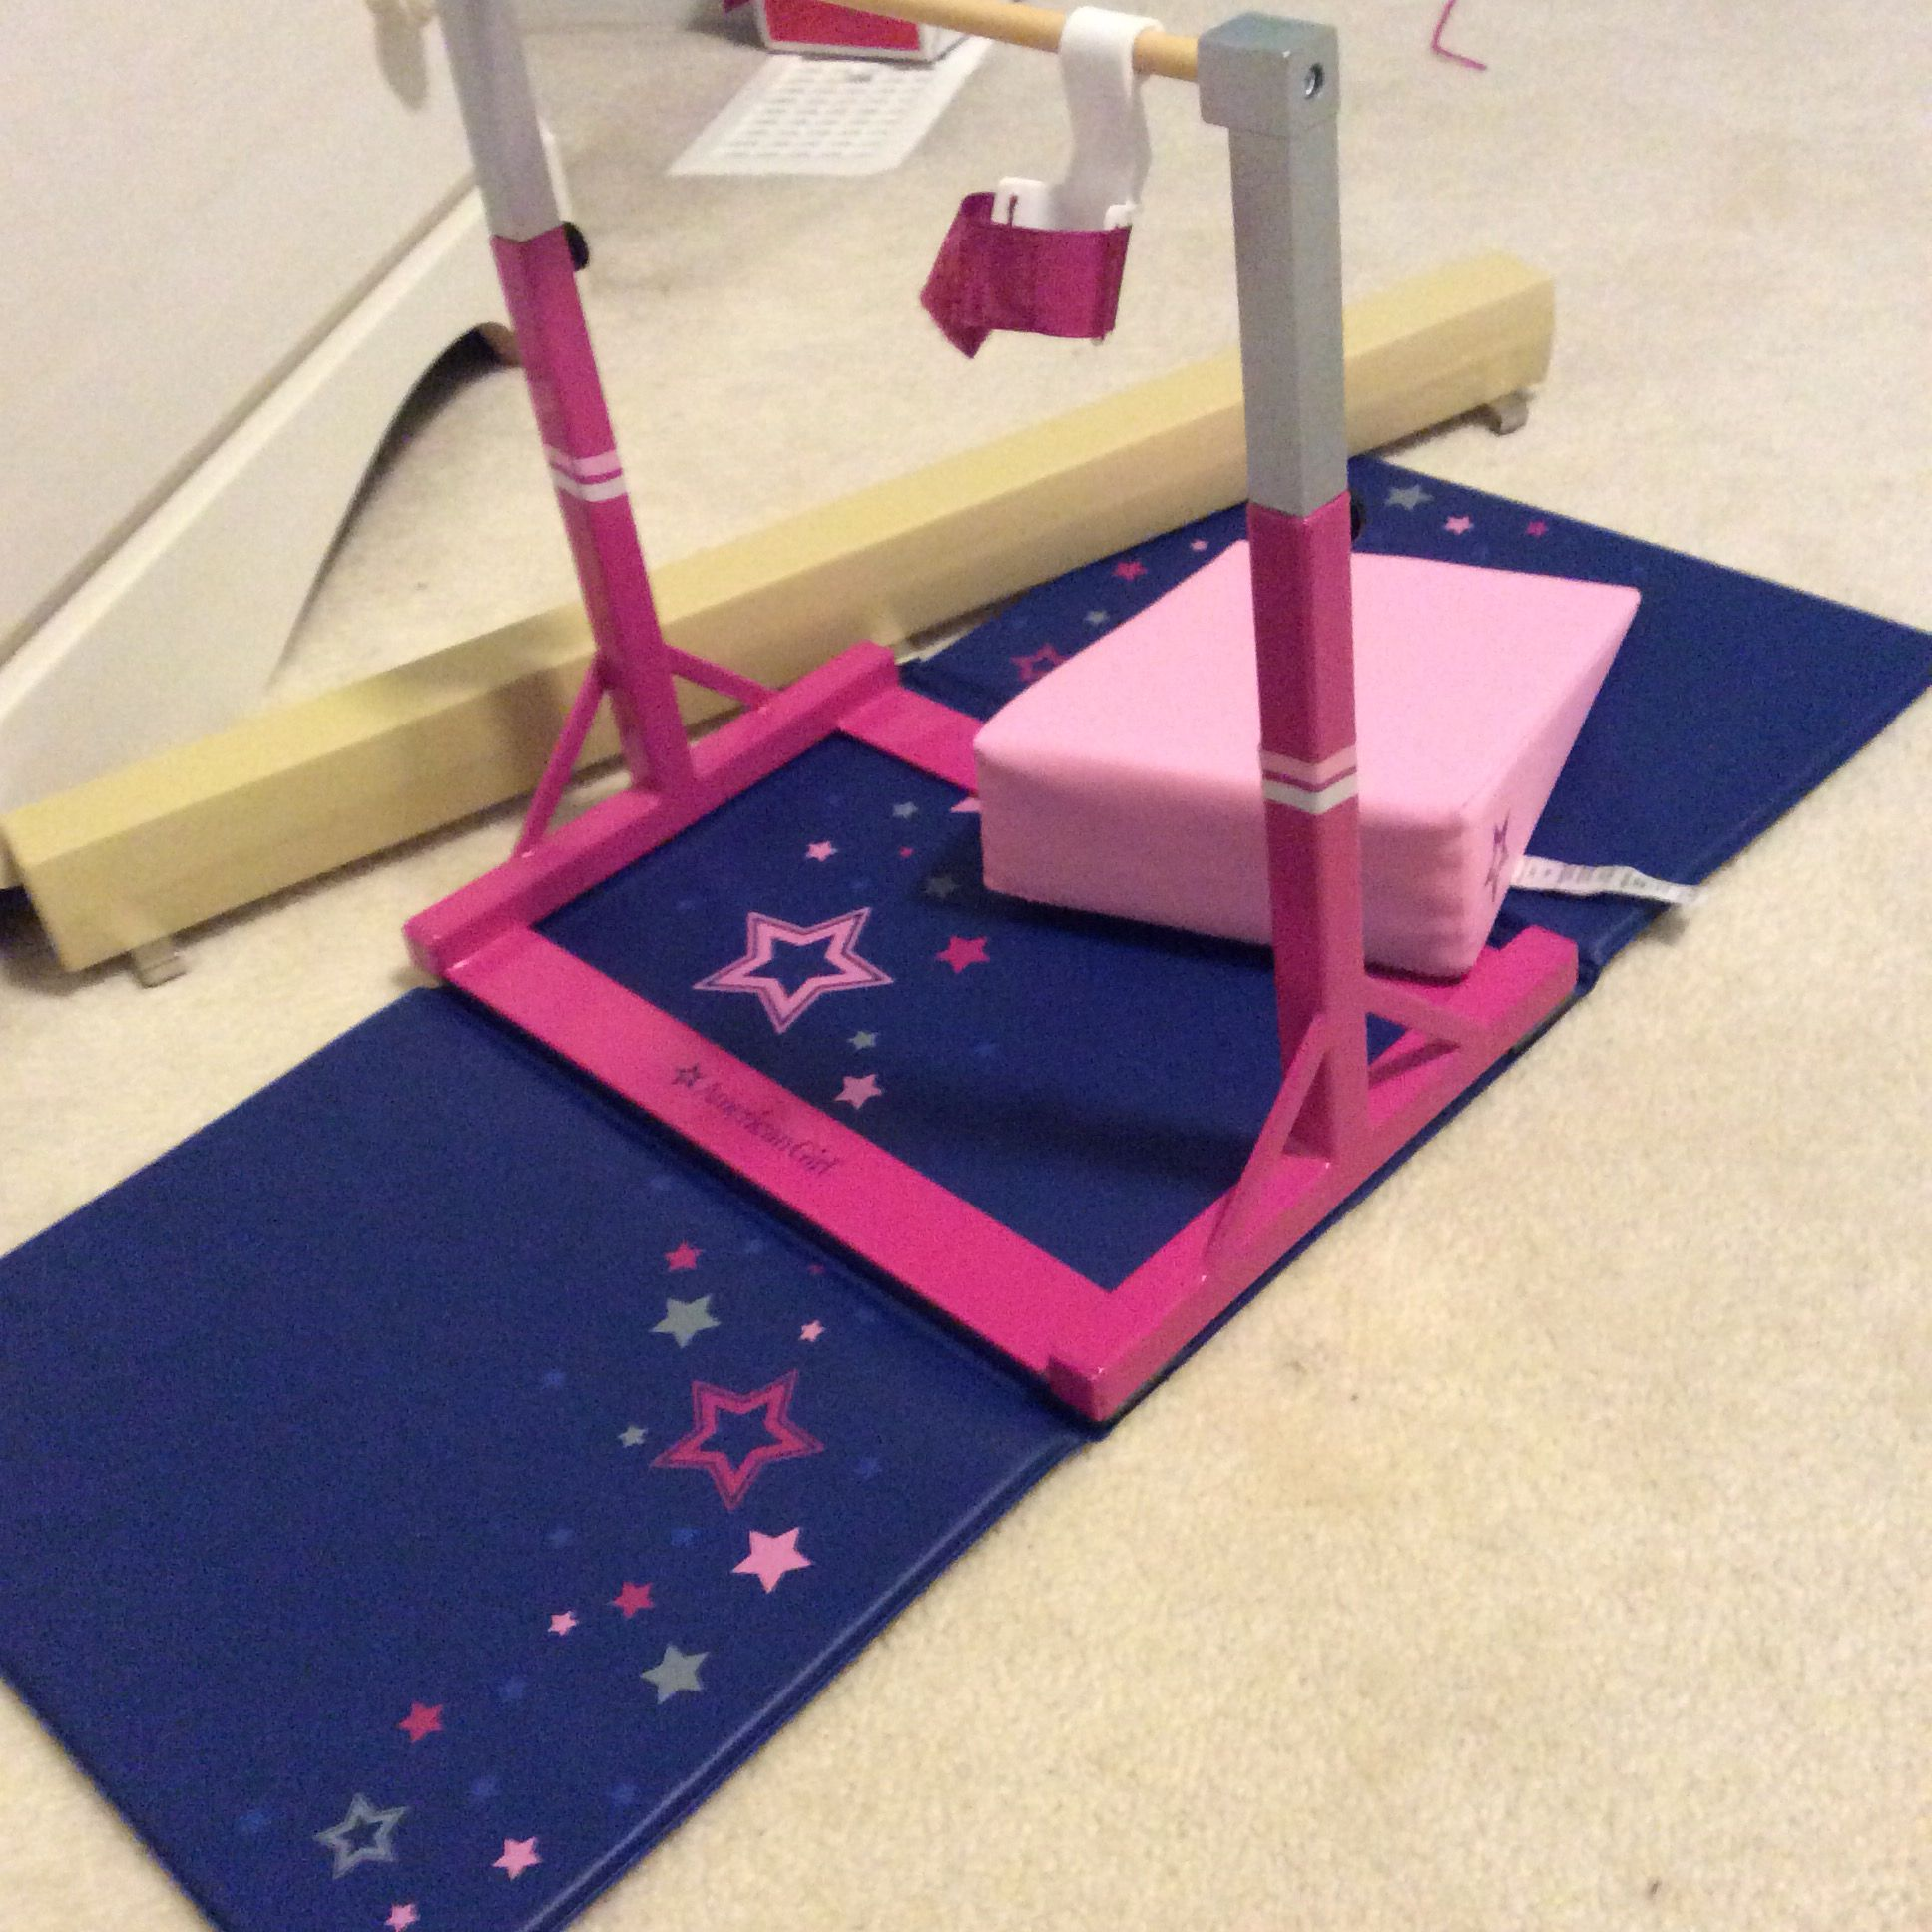 wonlink pin diy kids pu gymnastic yoga fitness mats mat ladies folding leather gymnastics for durable tumbling exercise